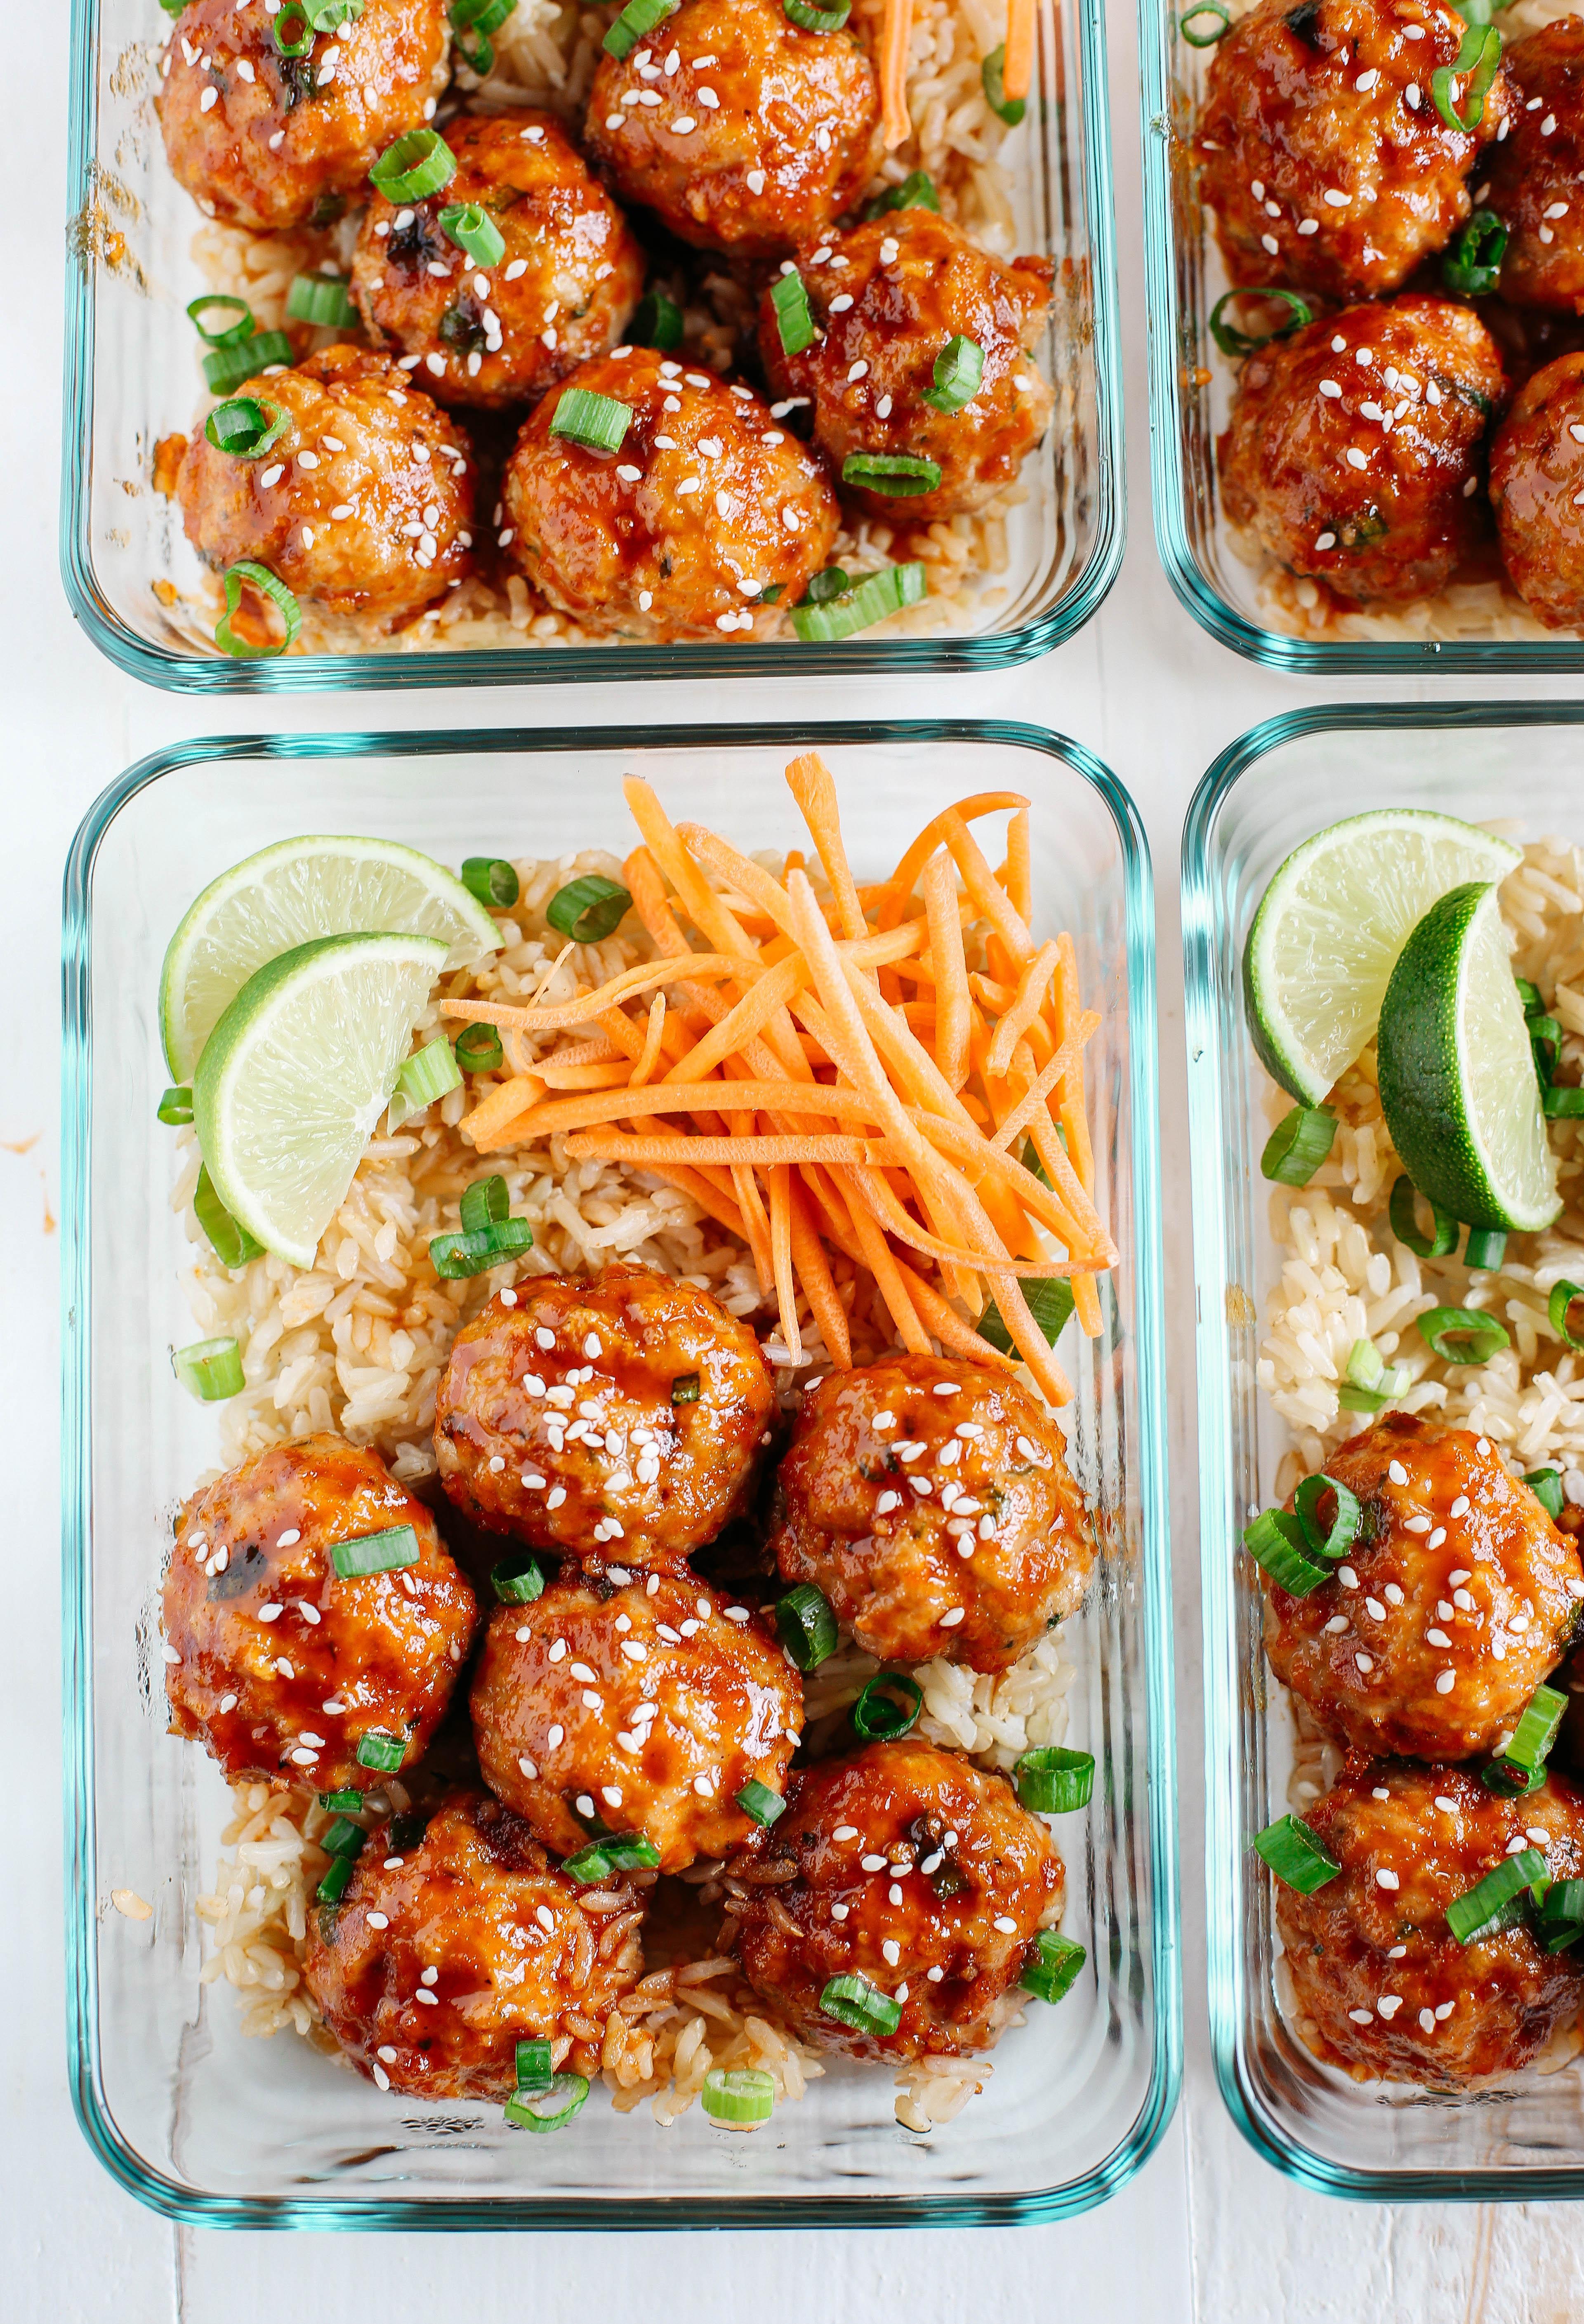 Honey Sriracha Glazed Meatballs - Eat Yourself Skinny